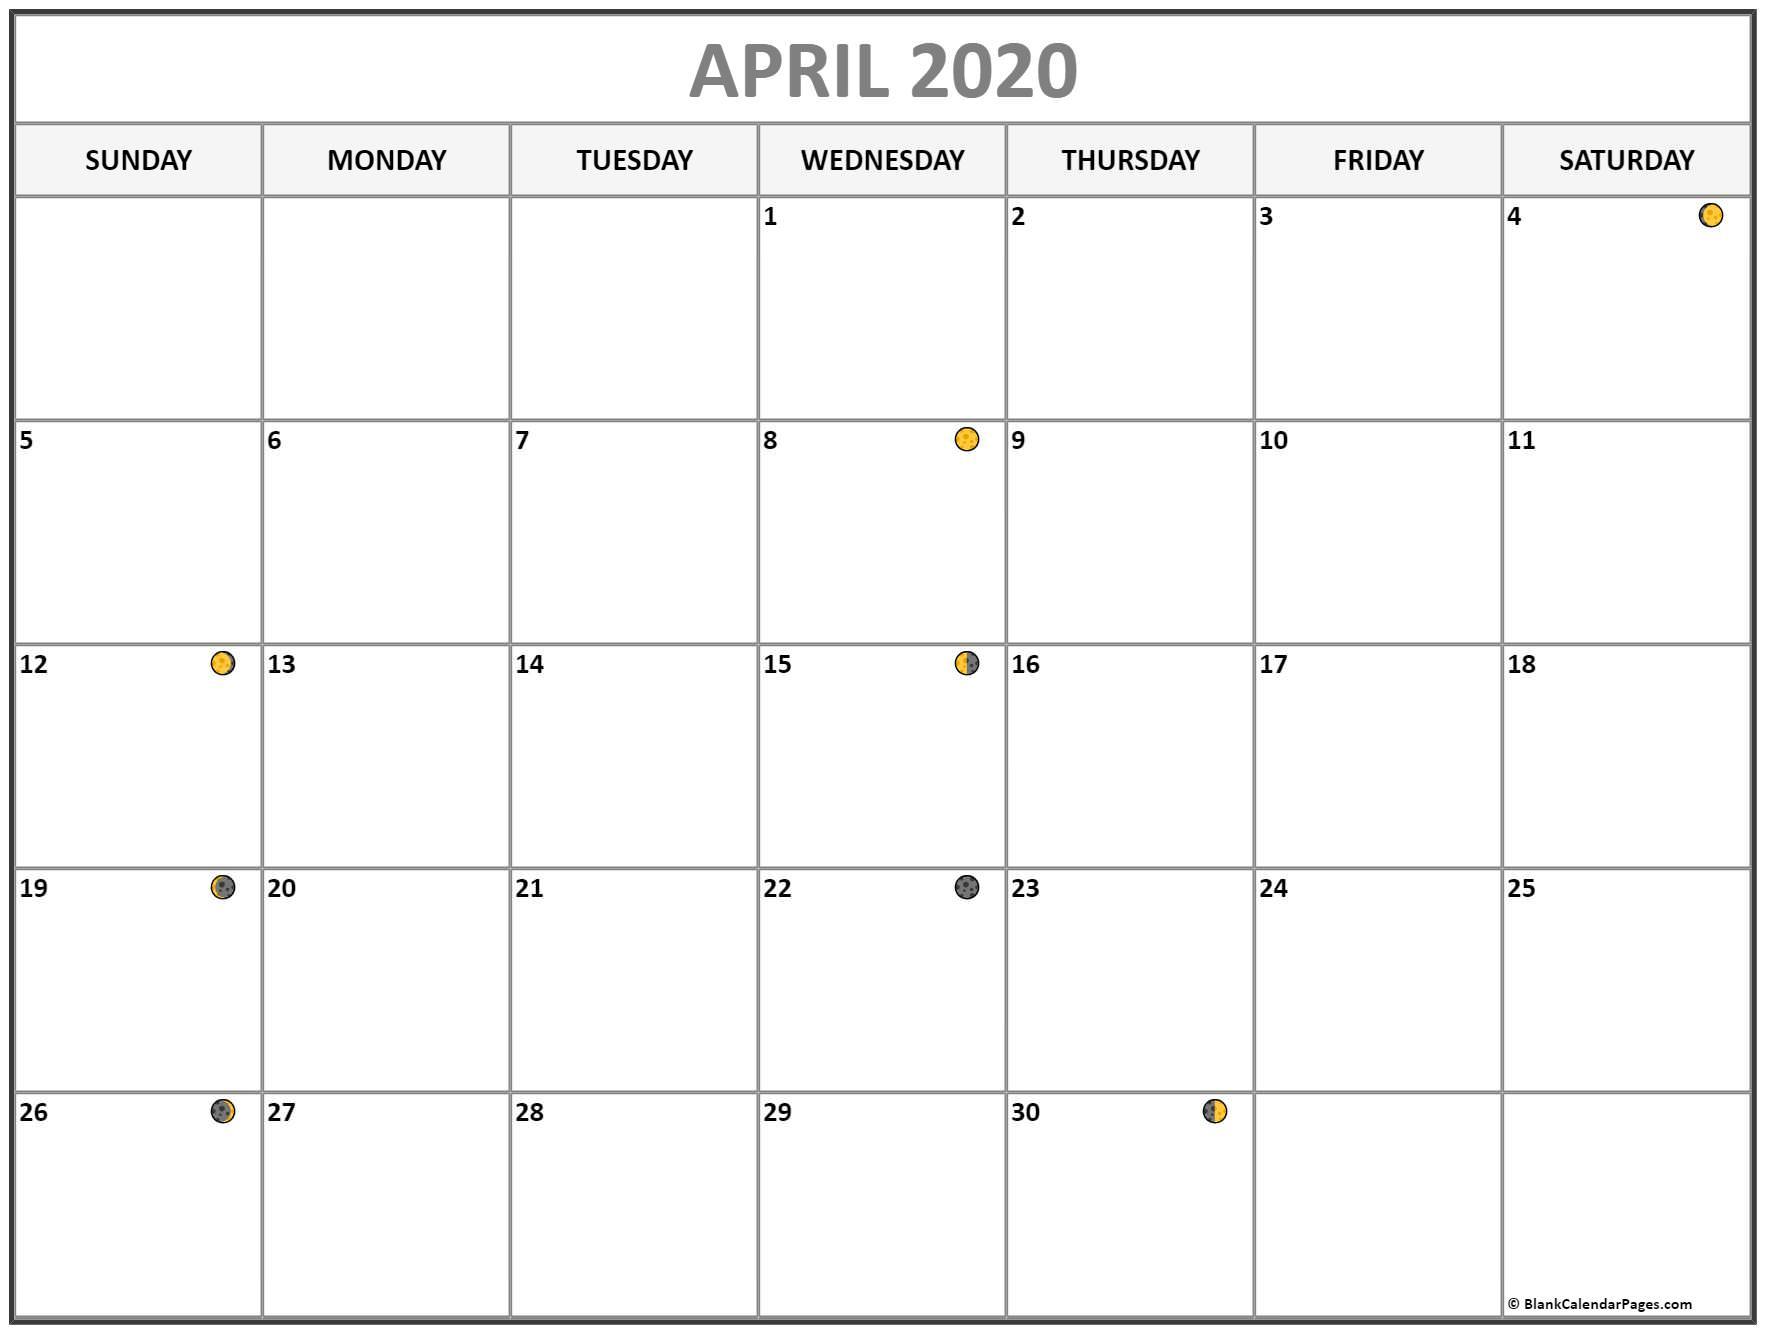 April 2020 Moon Phases Calendar